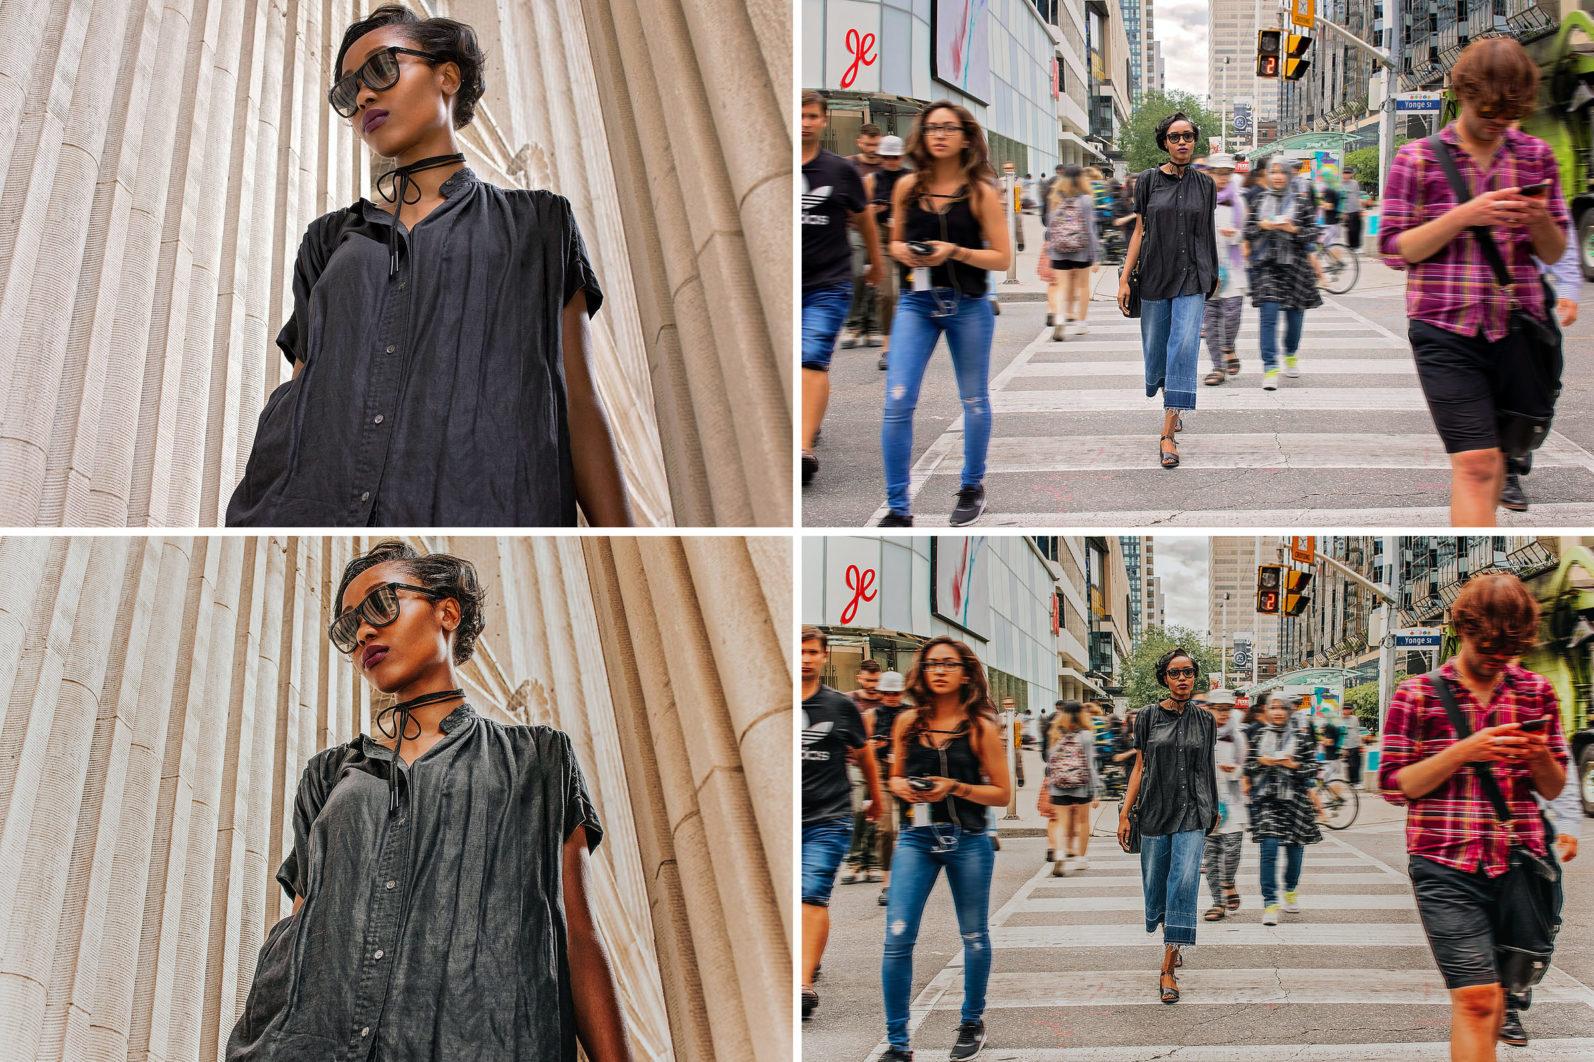 39. Street Fashion - 39.STREETFASHION 4 -